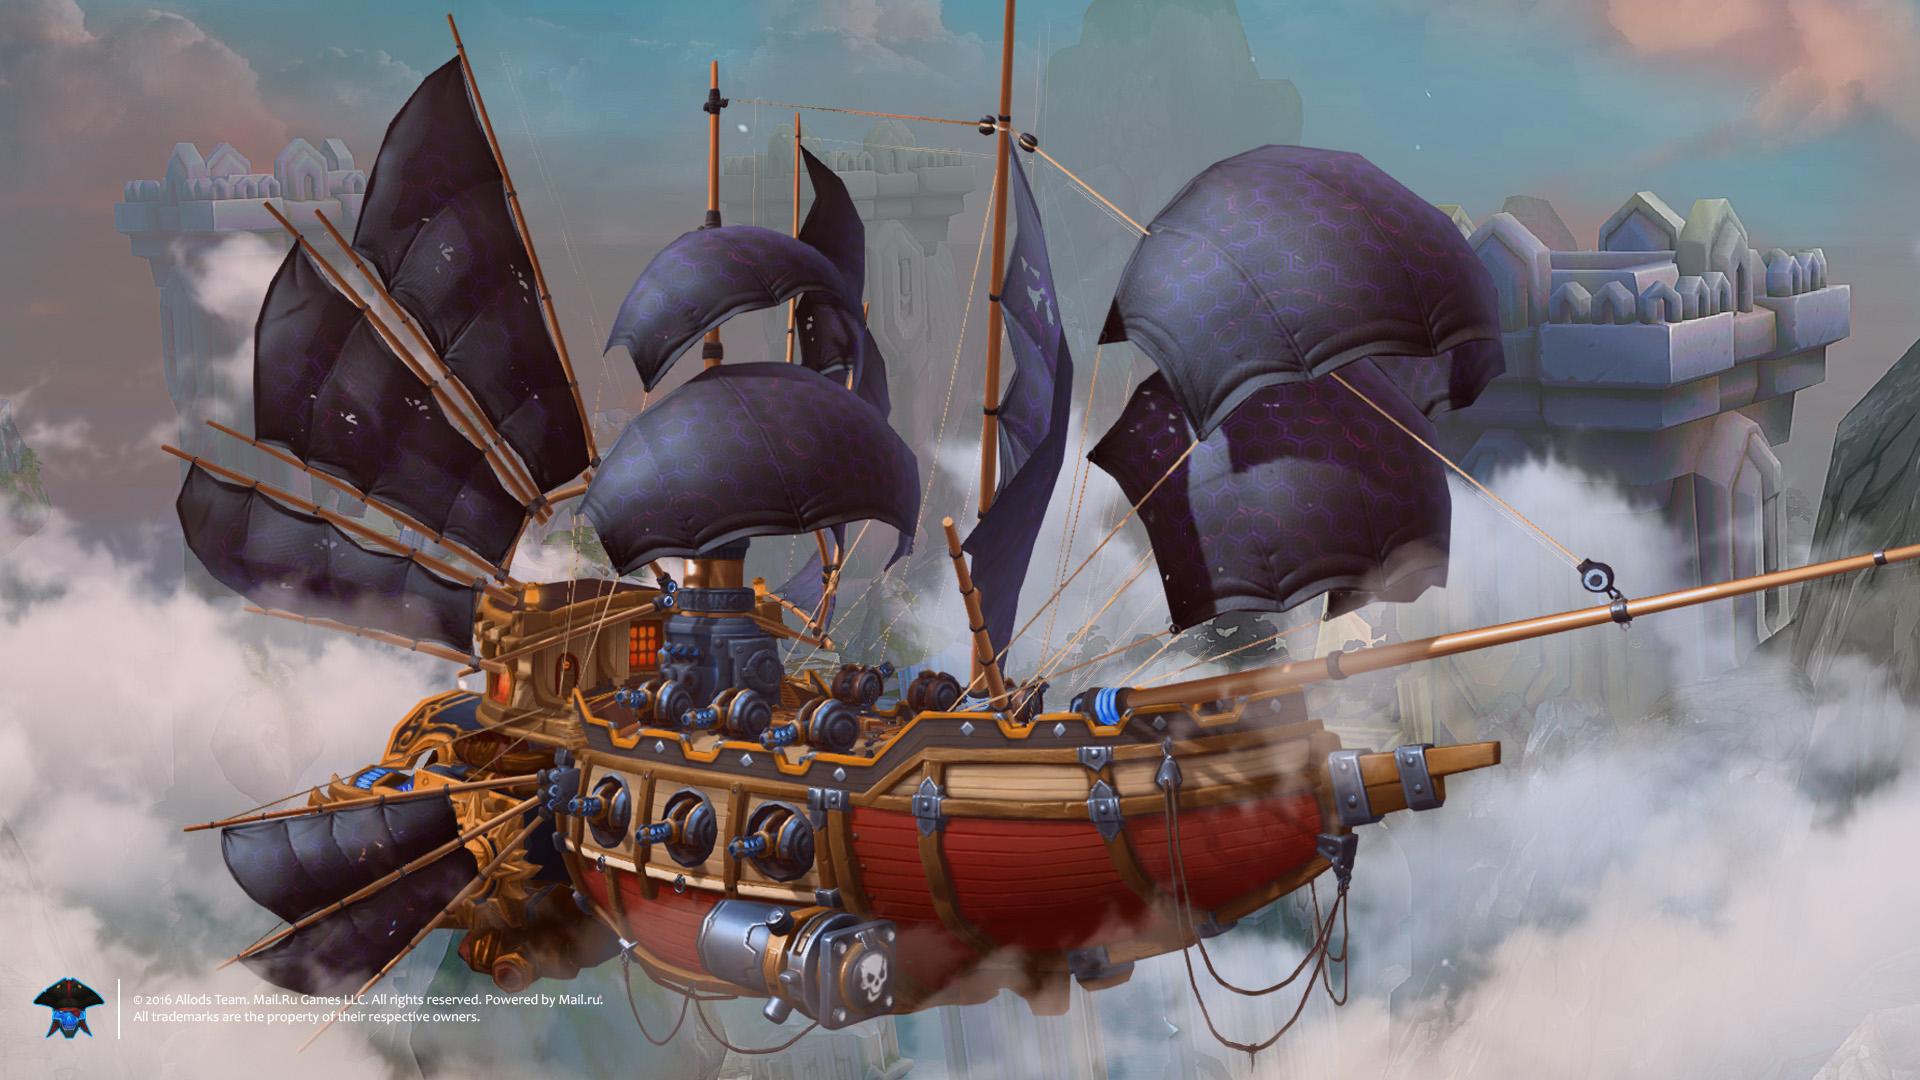 Картинка пираты штурм небеса